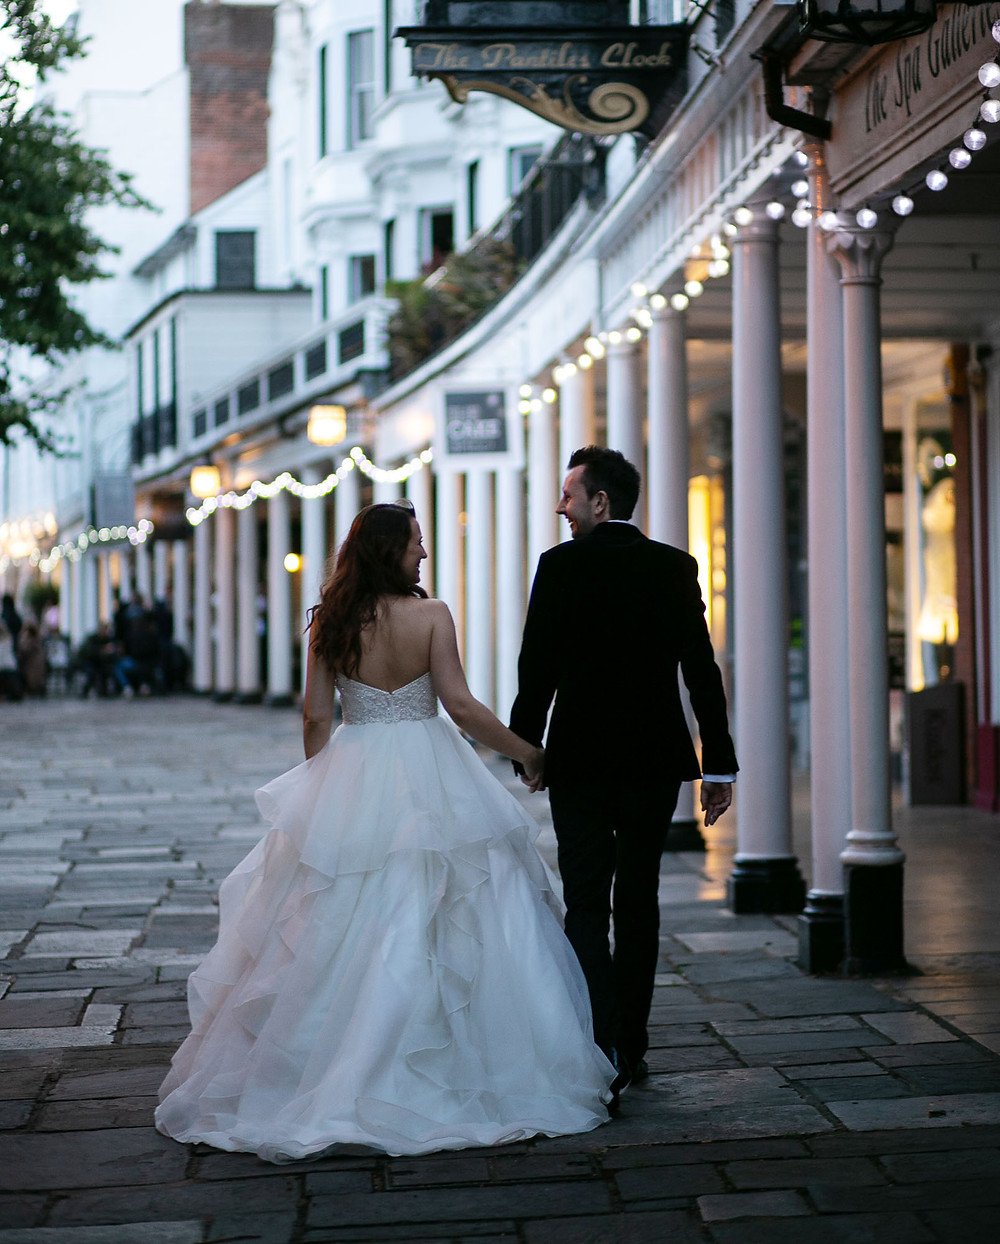 Bride and groom walking along The Pantiles in Tunbridge Wells